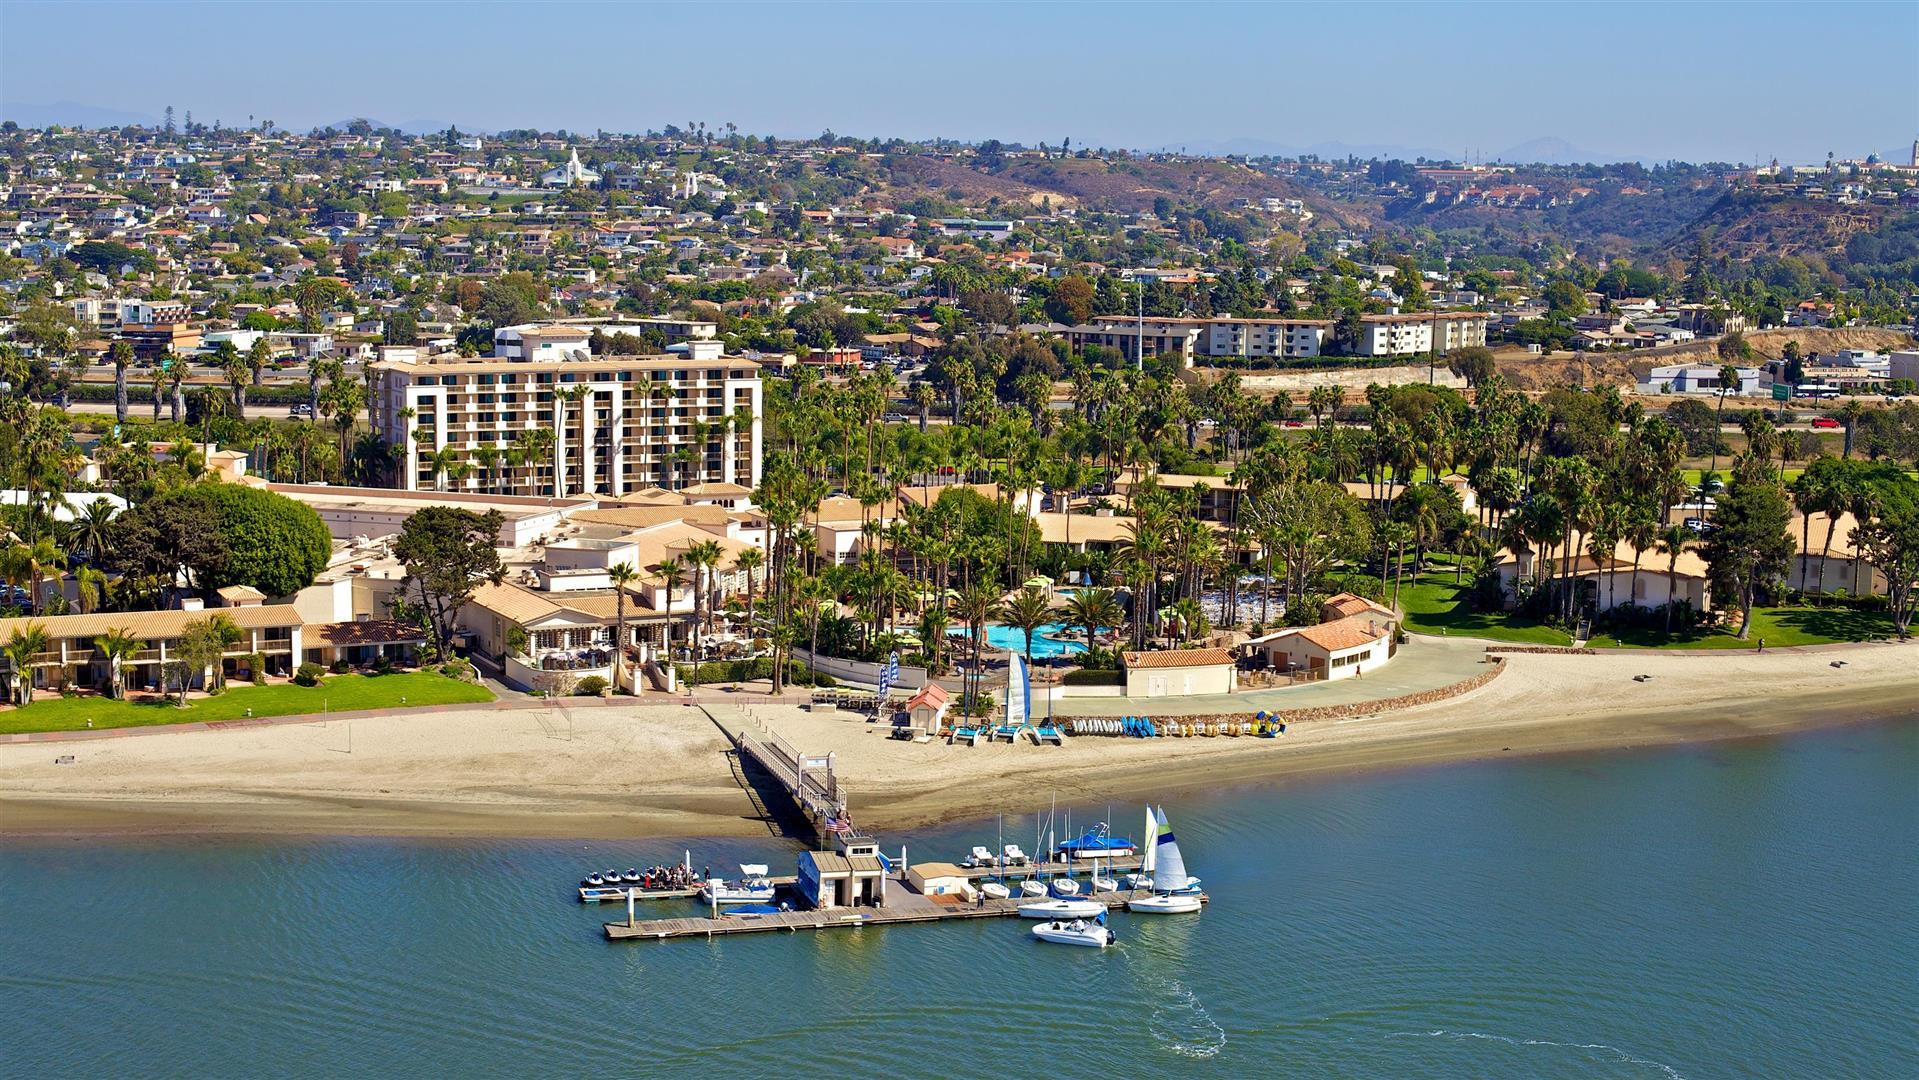 Meetings And Events At Hilton San Diego Resort U0026 Spa, San ...